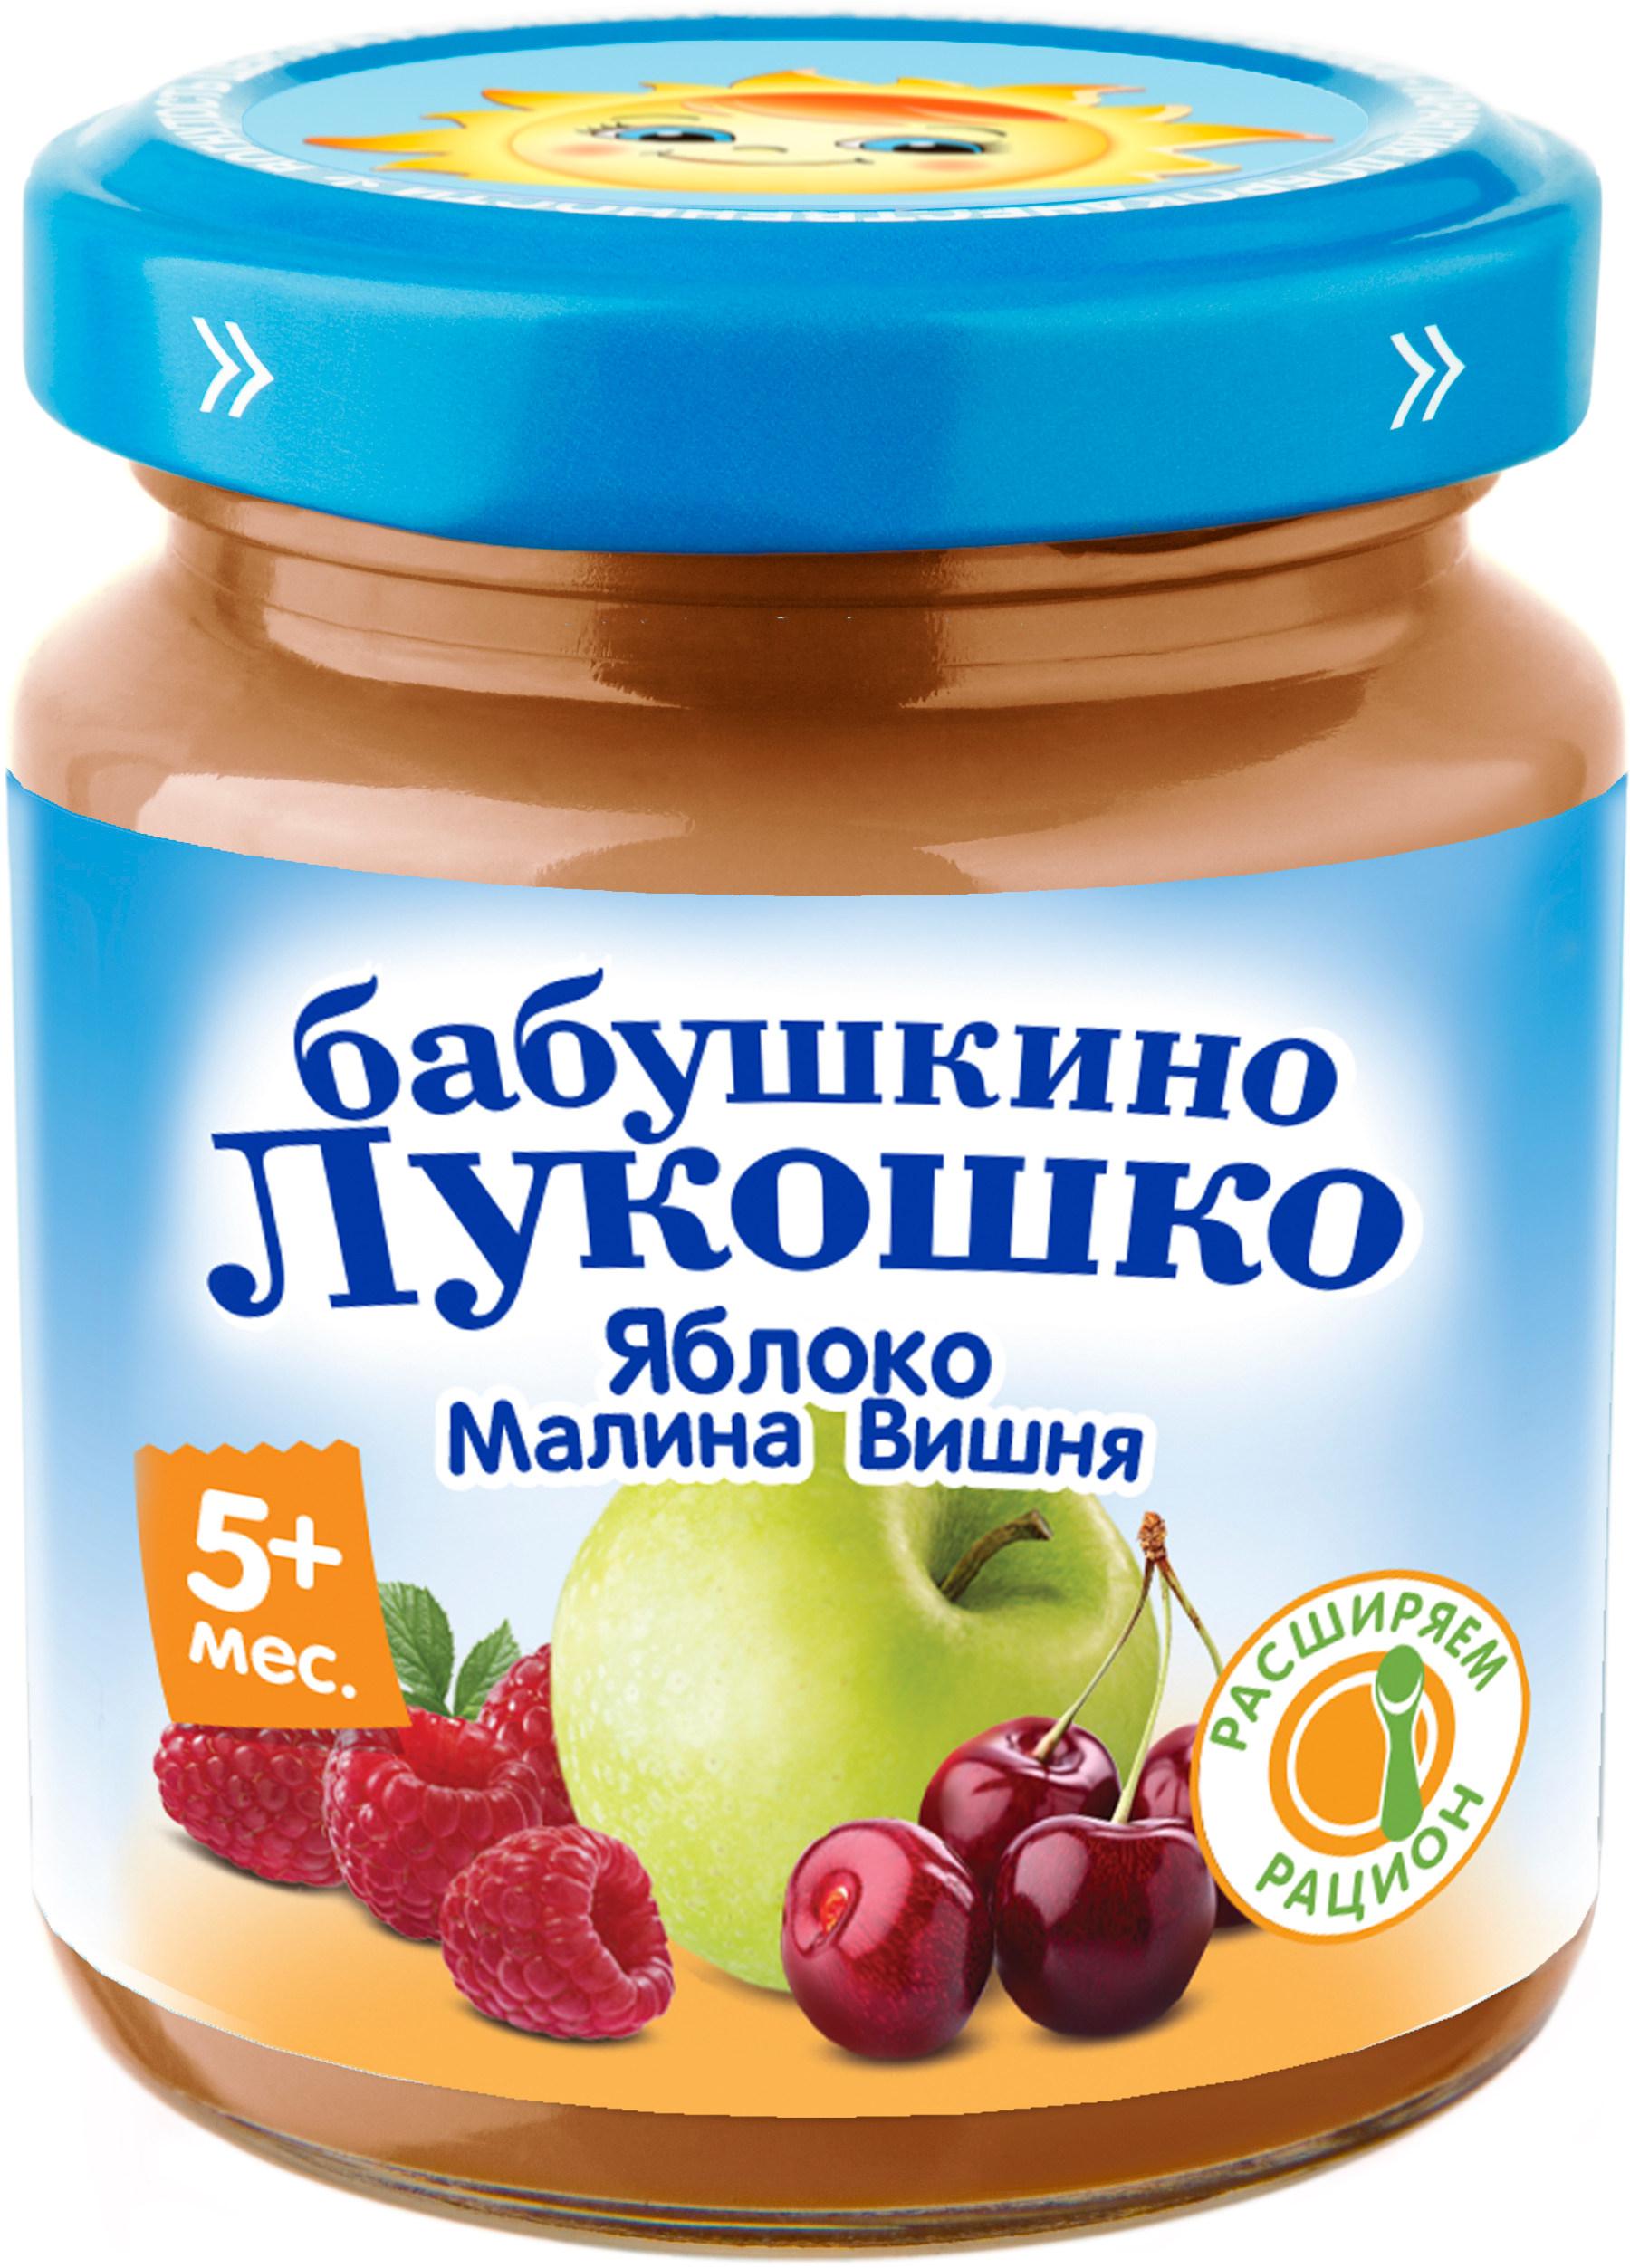 Пюре Бабушкино лукошко Бабушкино лукошко Яблоко, малина, вишня с 5 мес. 100 г цена 2017